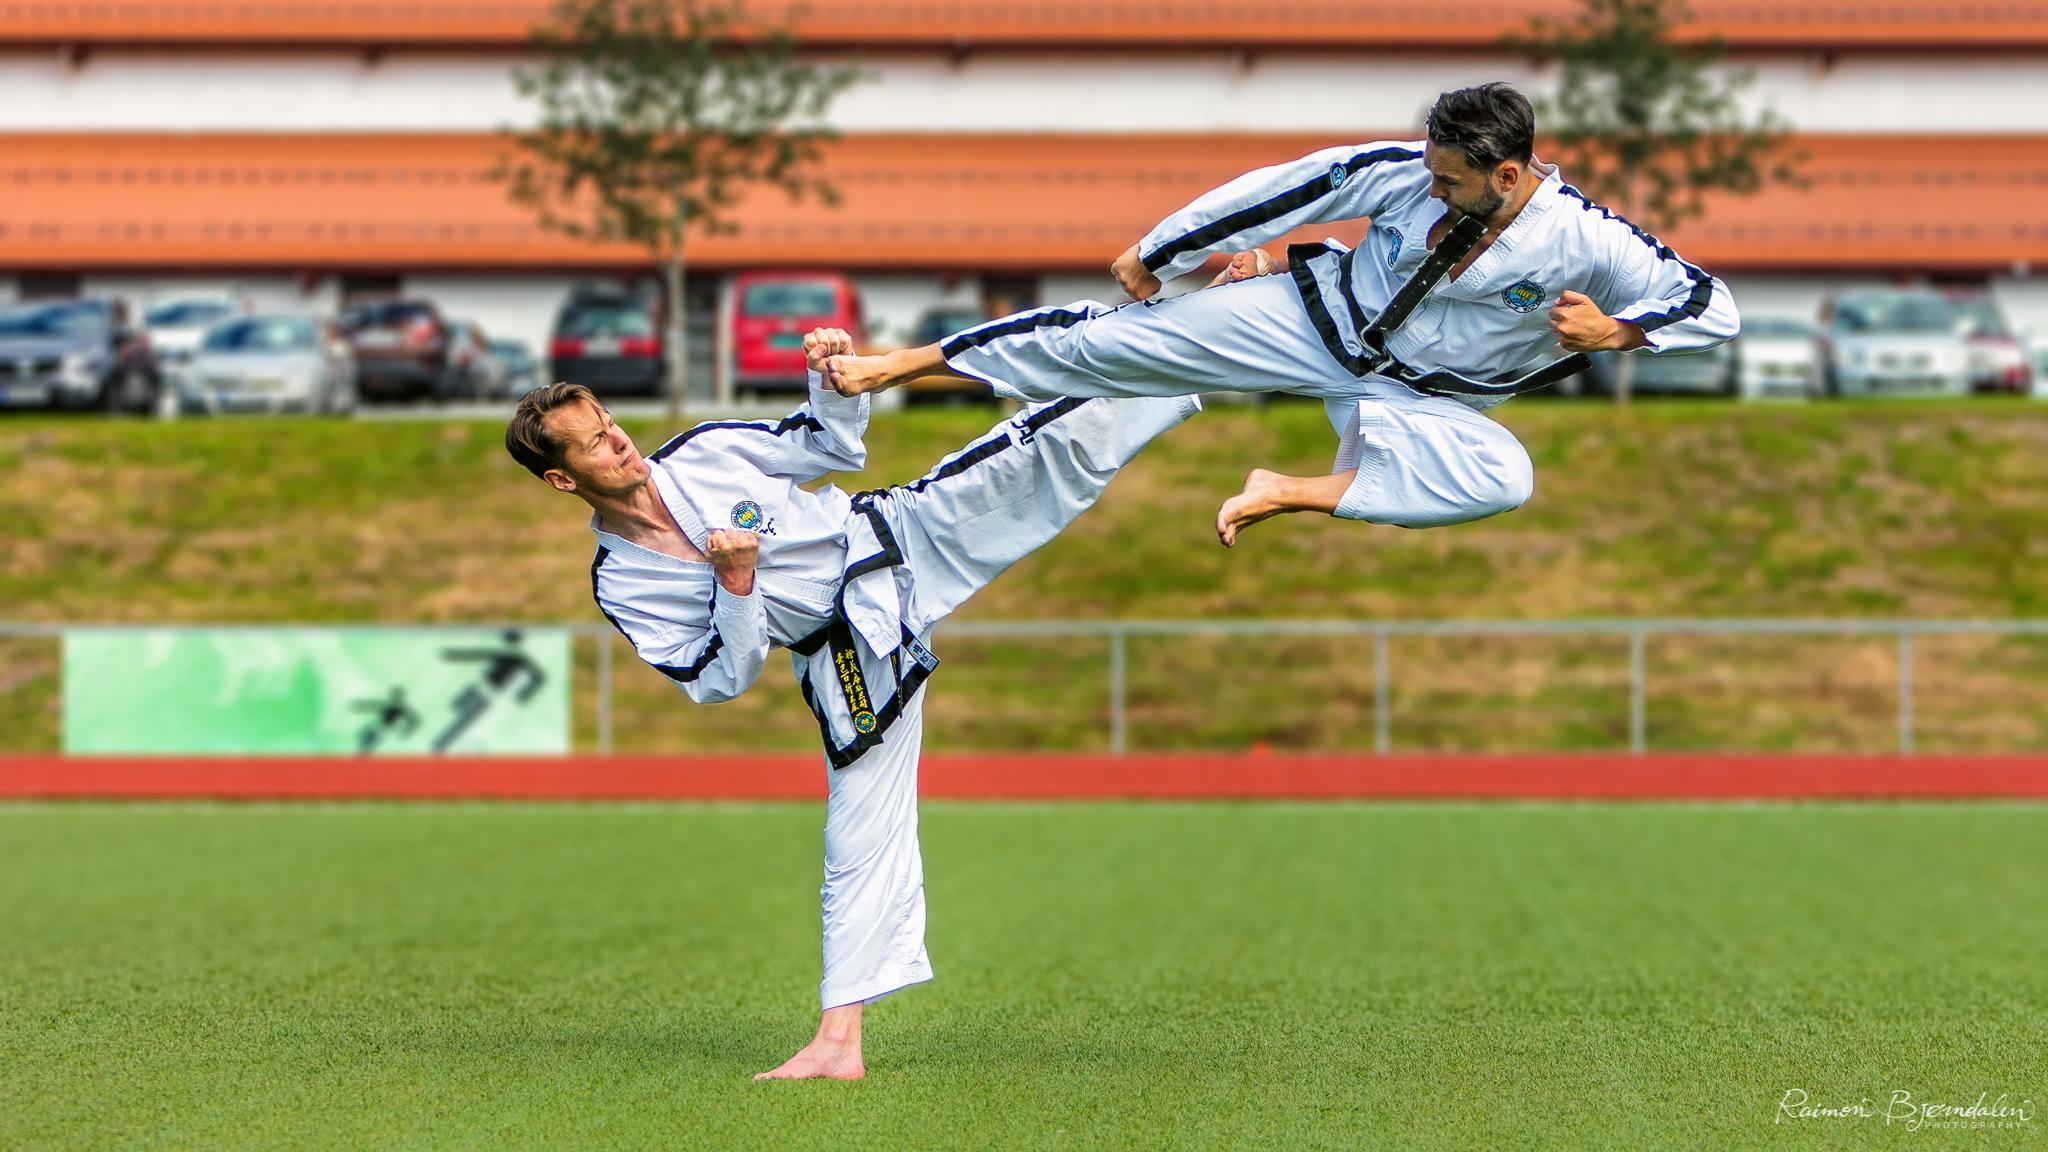 ITF Kickers during the National Taekwon-do Norway summer camp 2017.